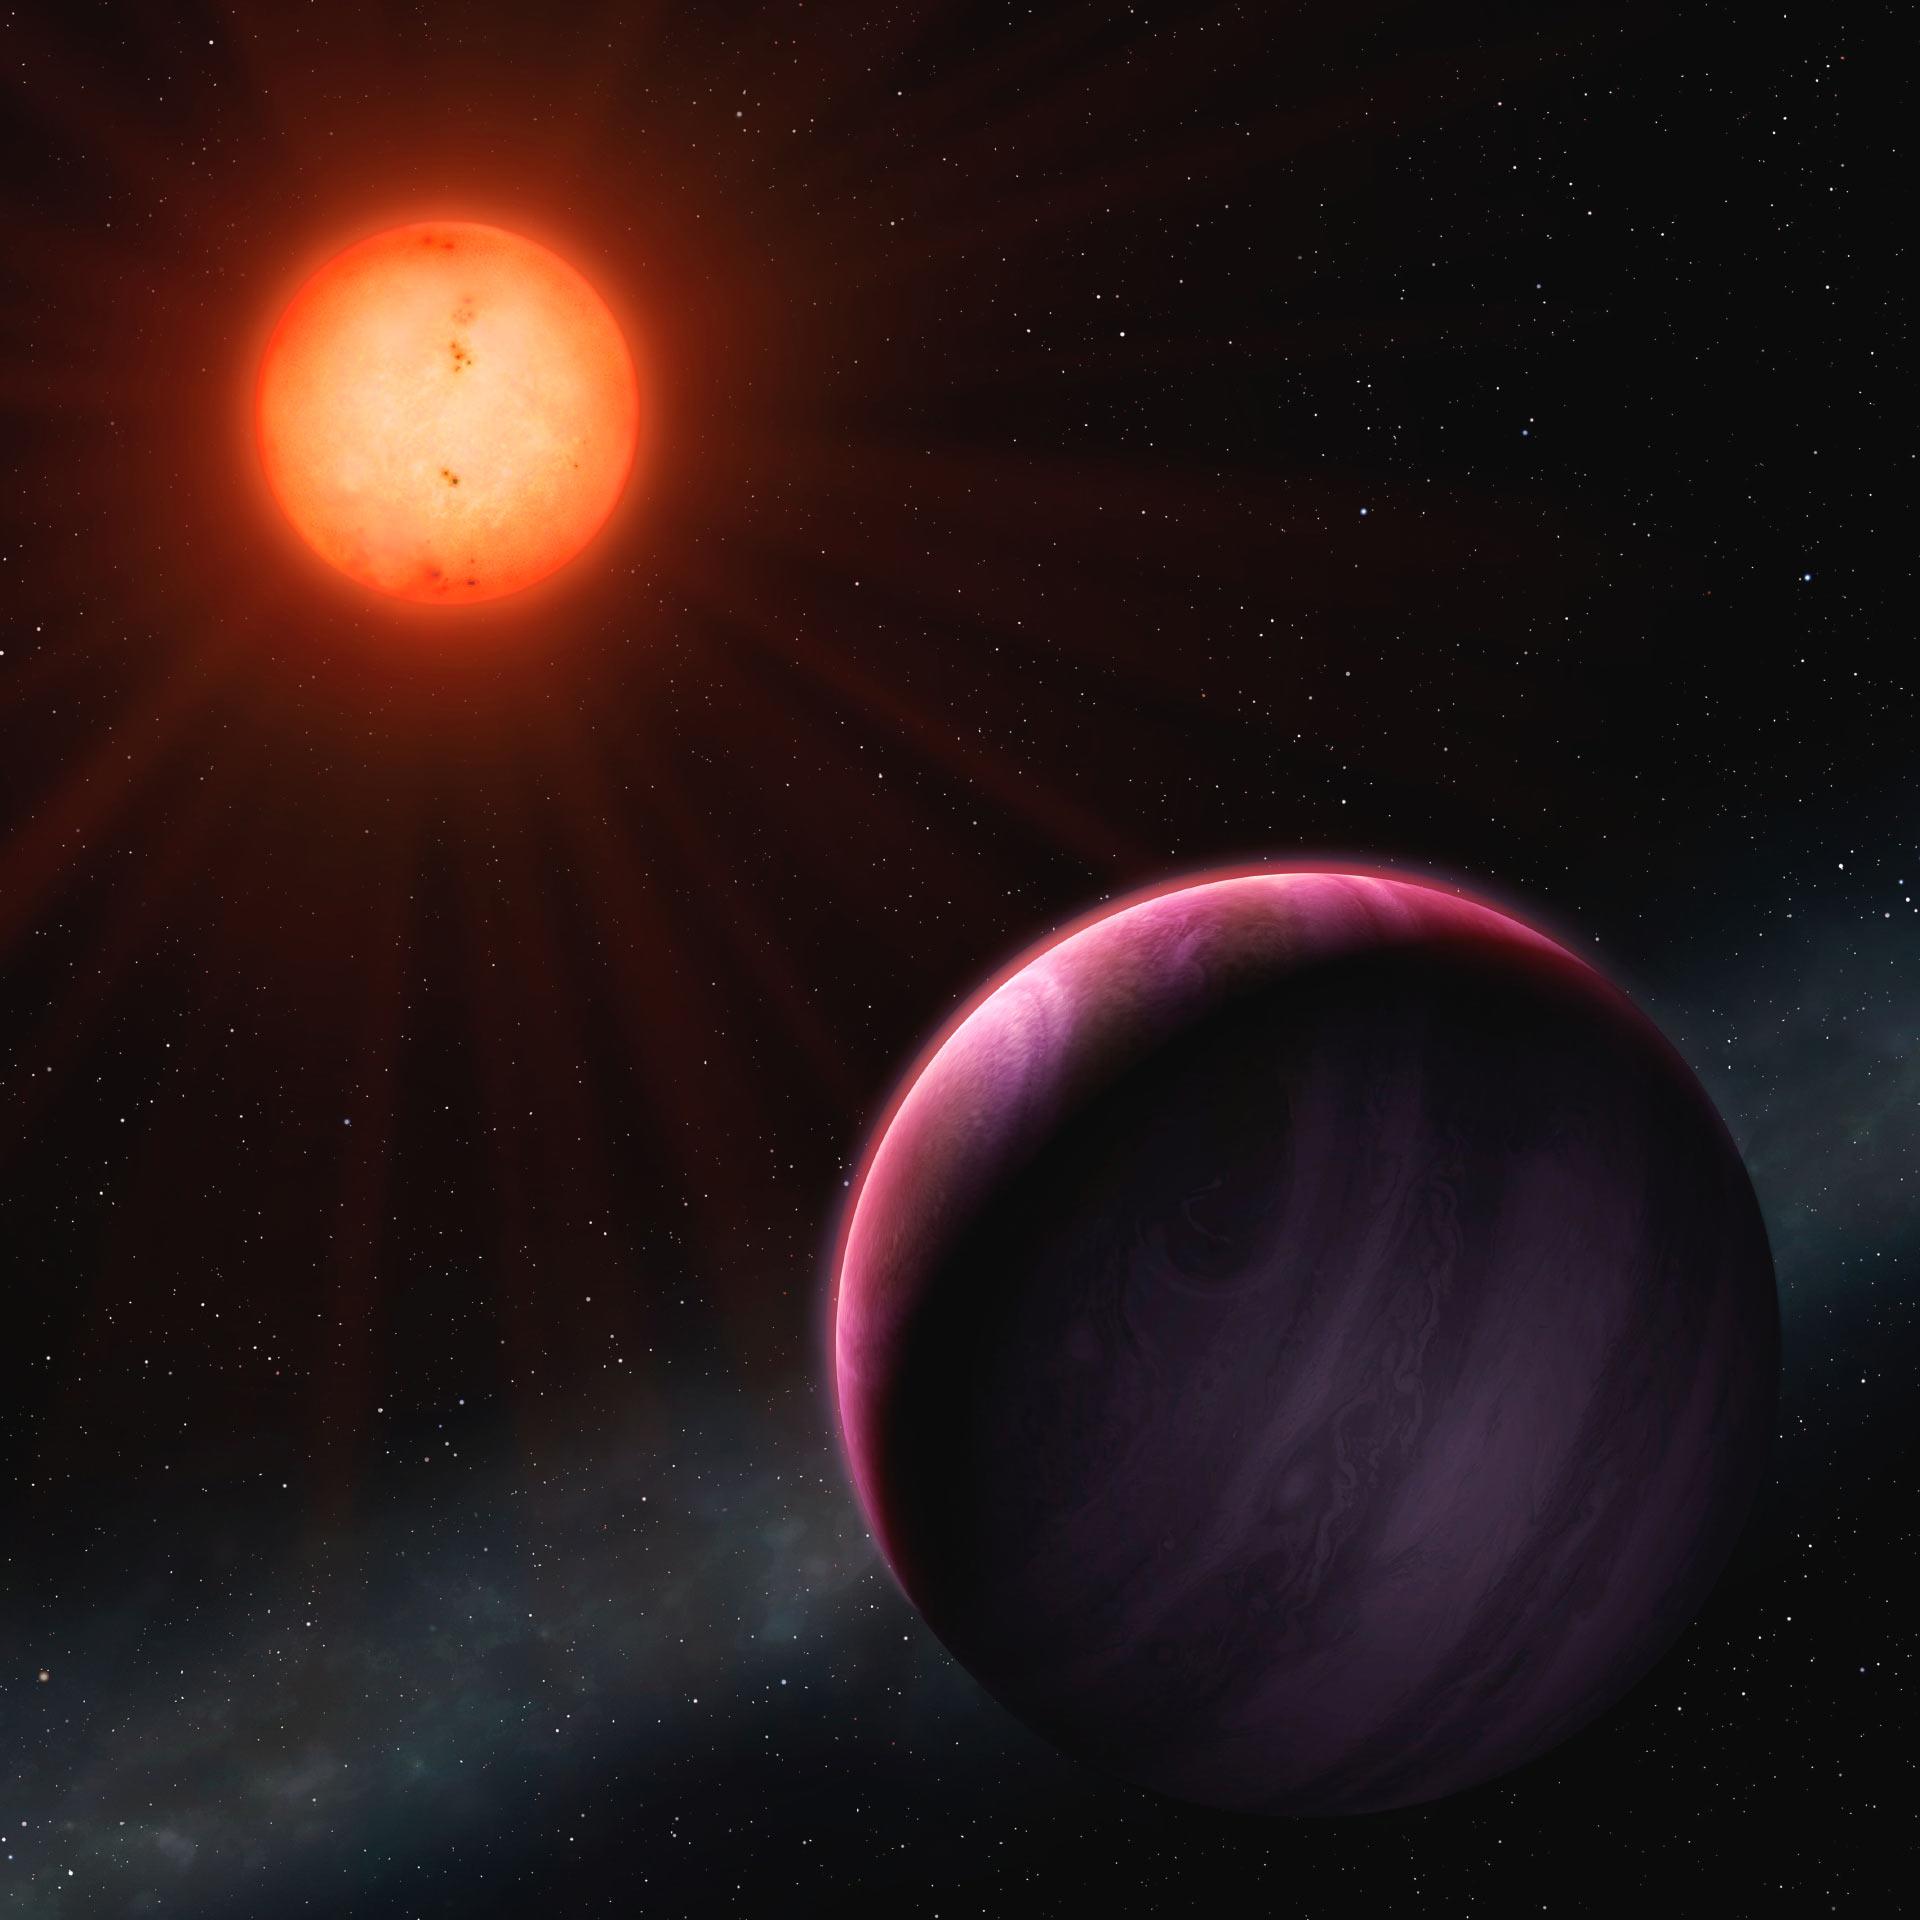 pianeta-mostro-ngts-1b